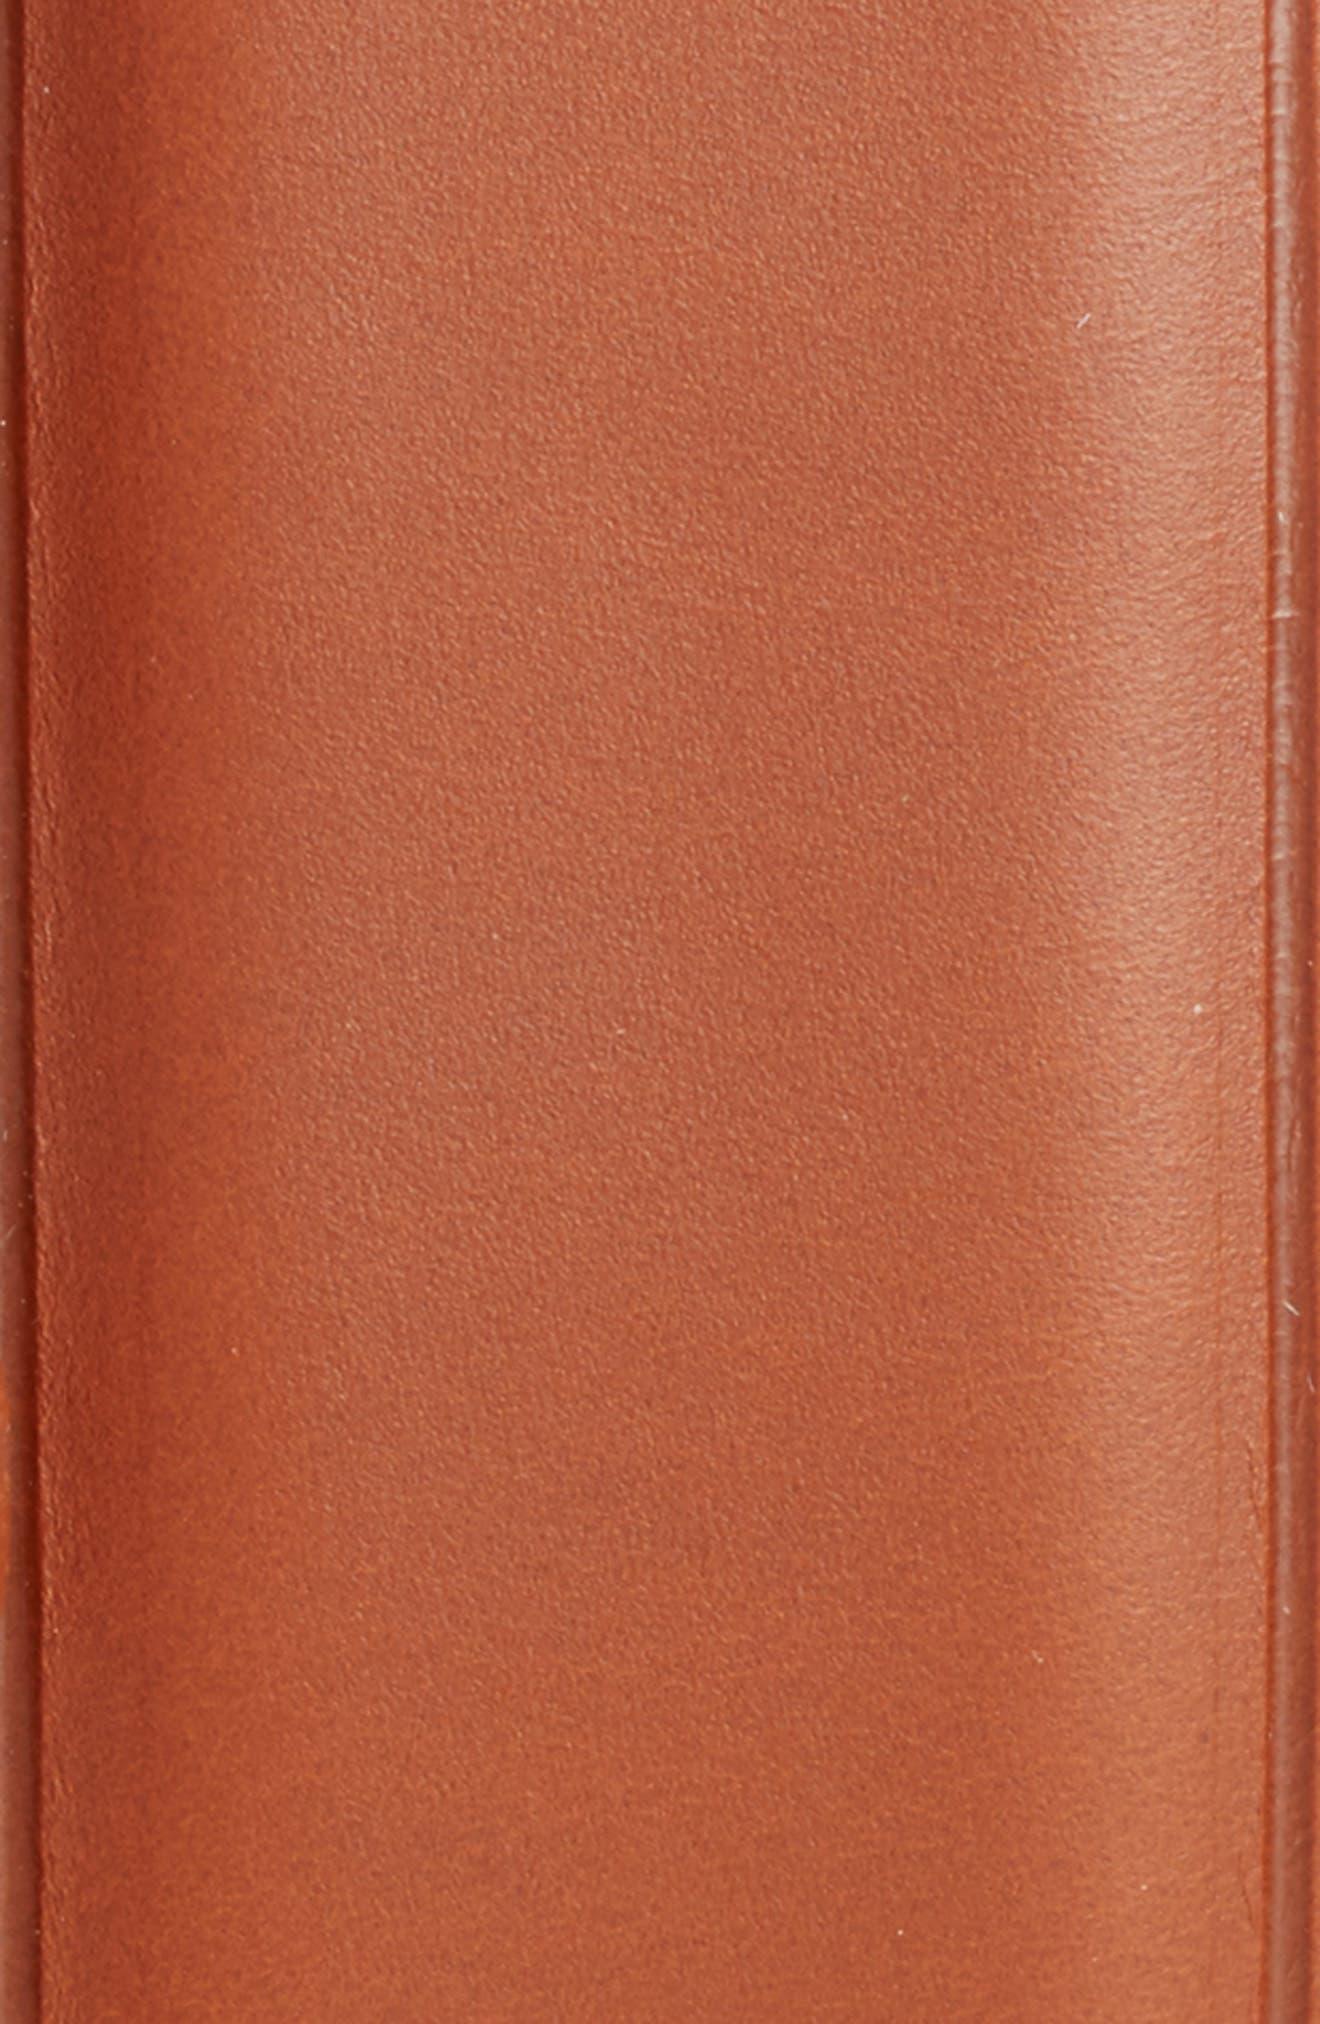 Alternate Image 2  - Peter Millar Classic Leather Dress Belt